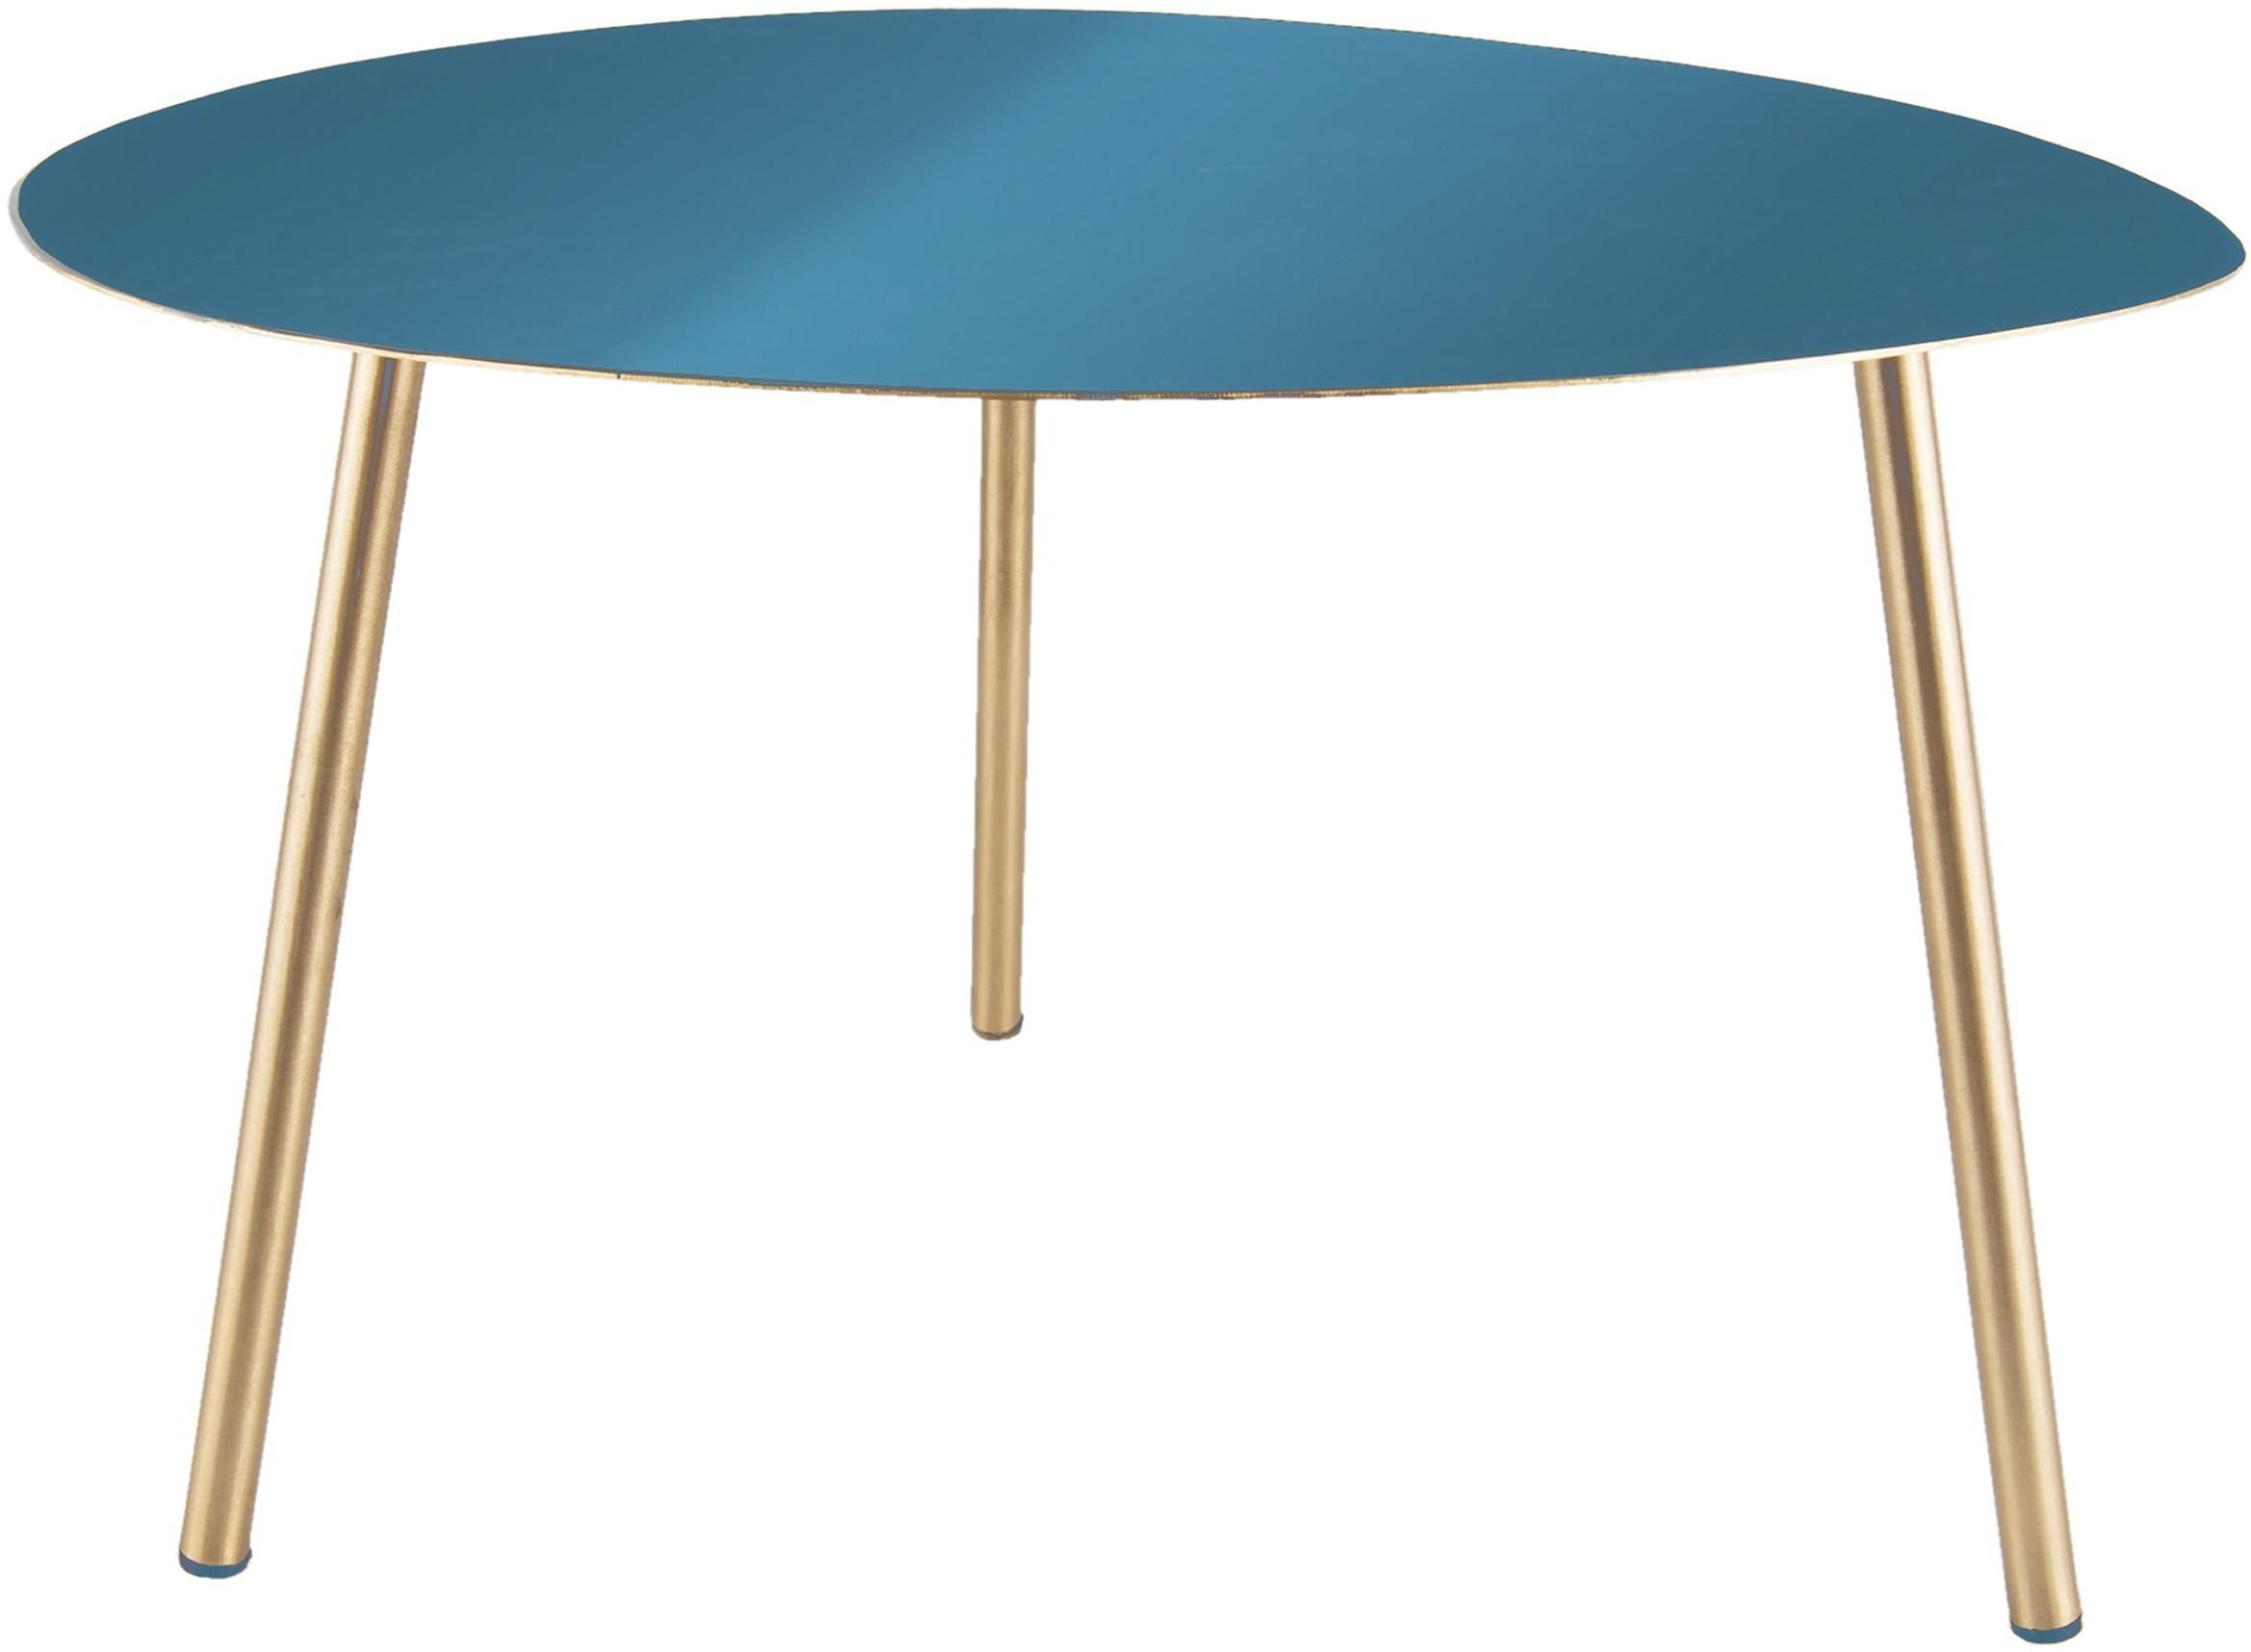 Veľký modro-zlatý stolík Ovoid